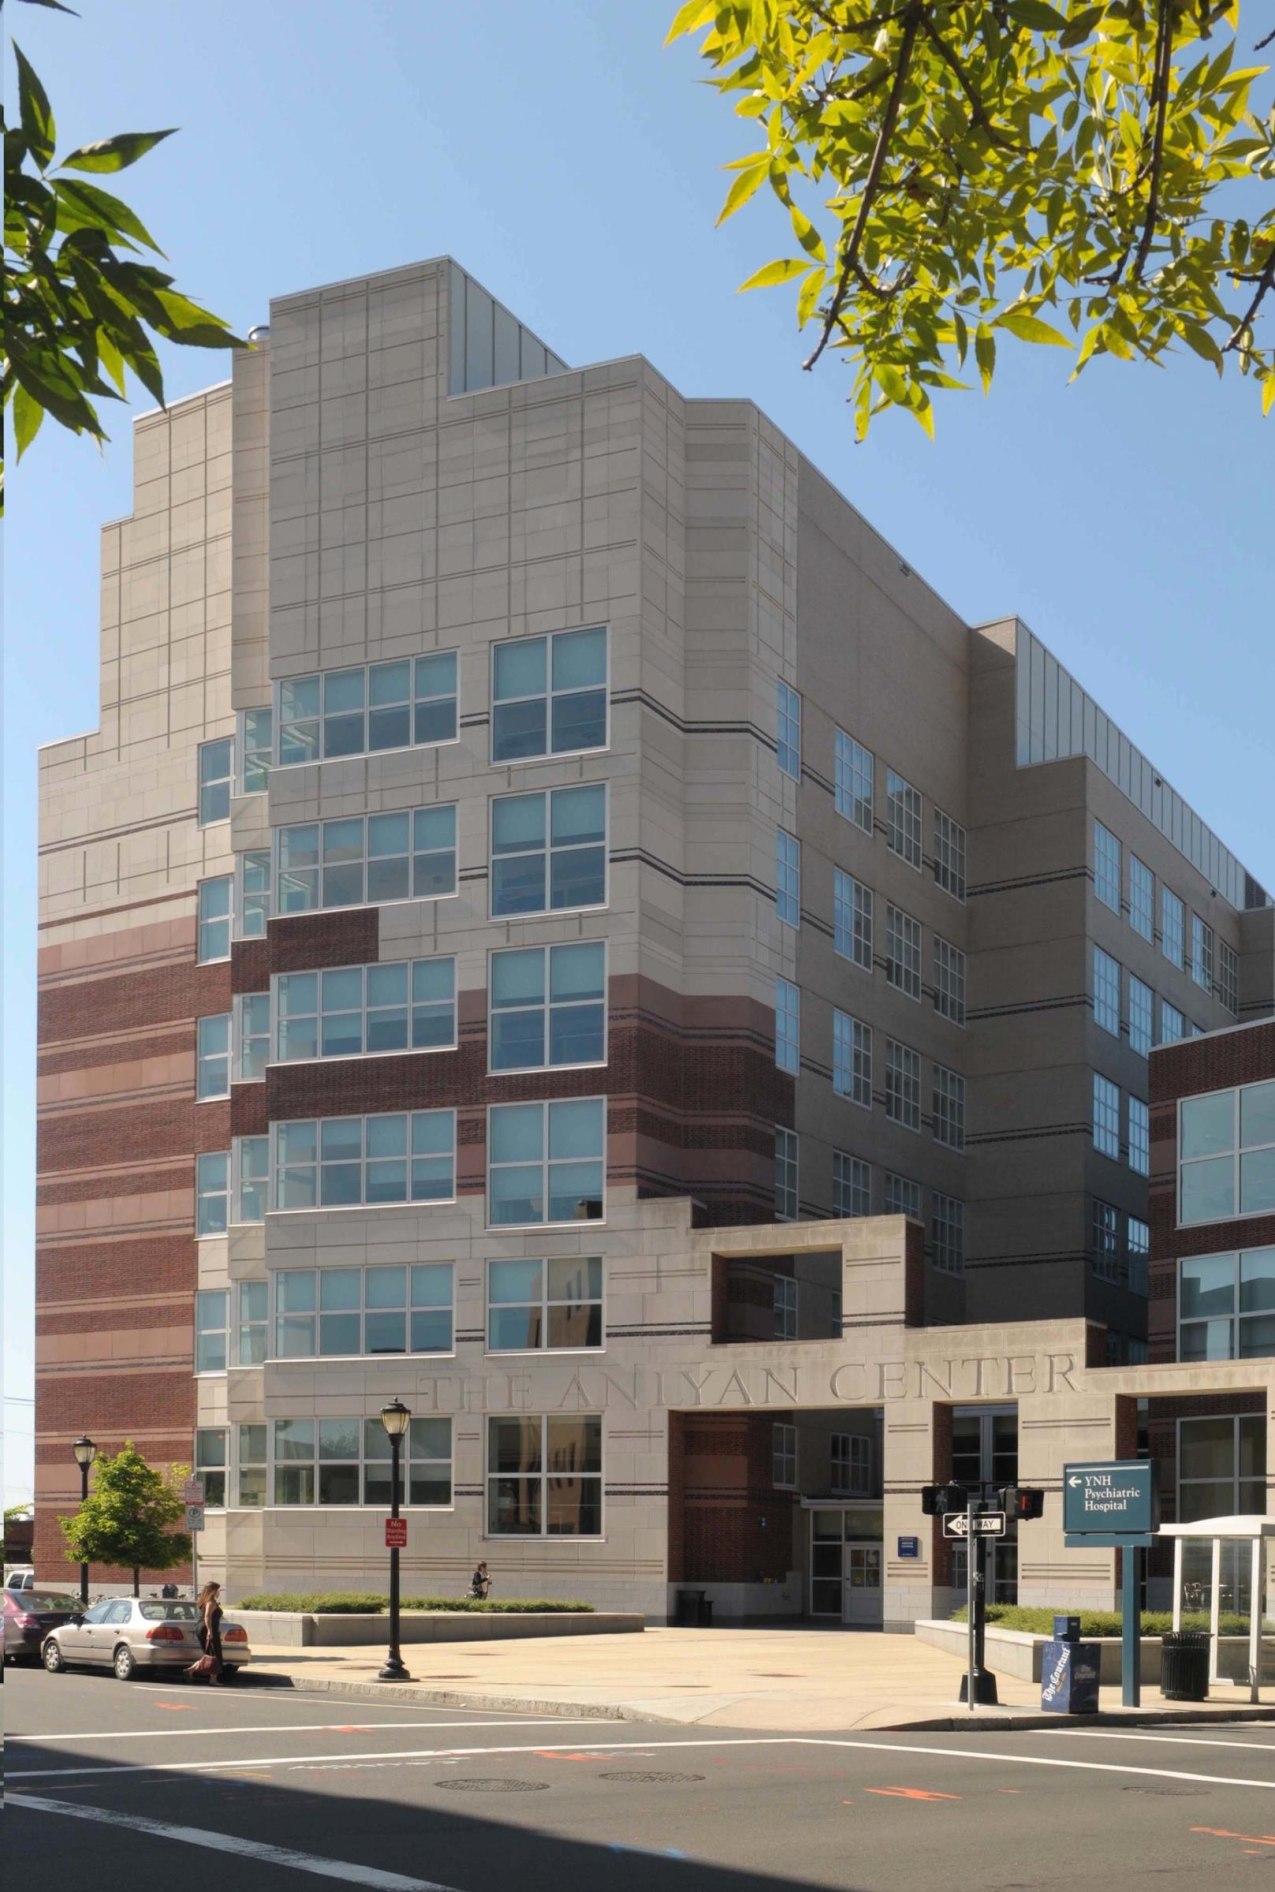 The Anlyan Center